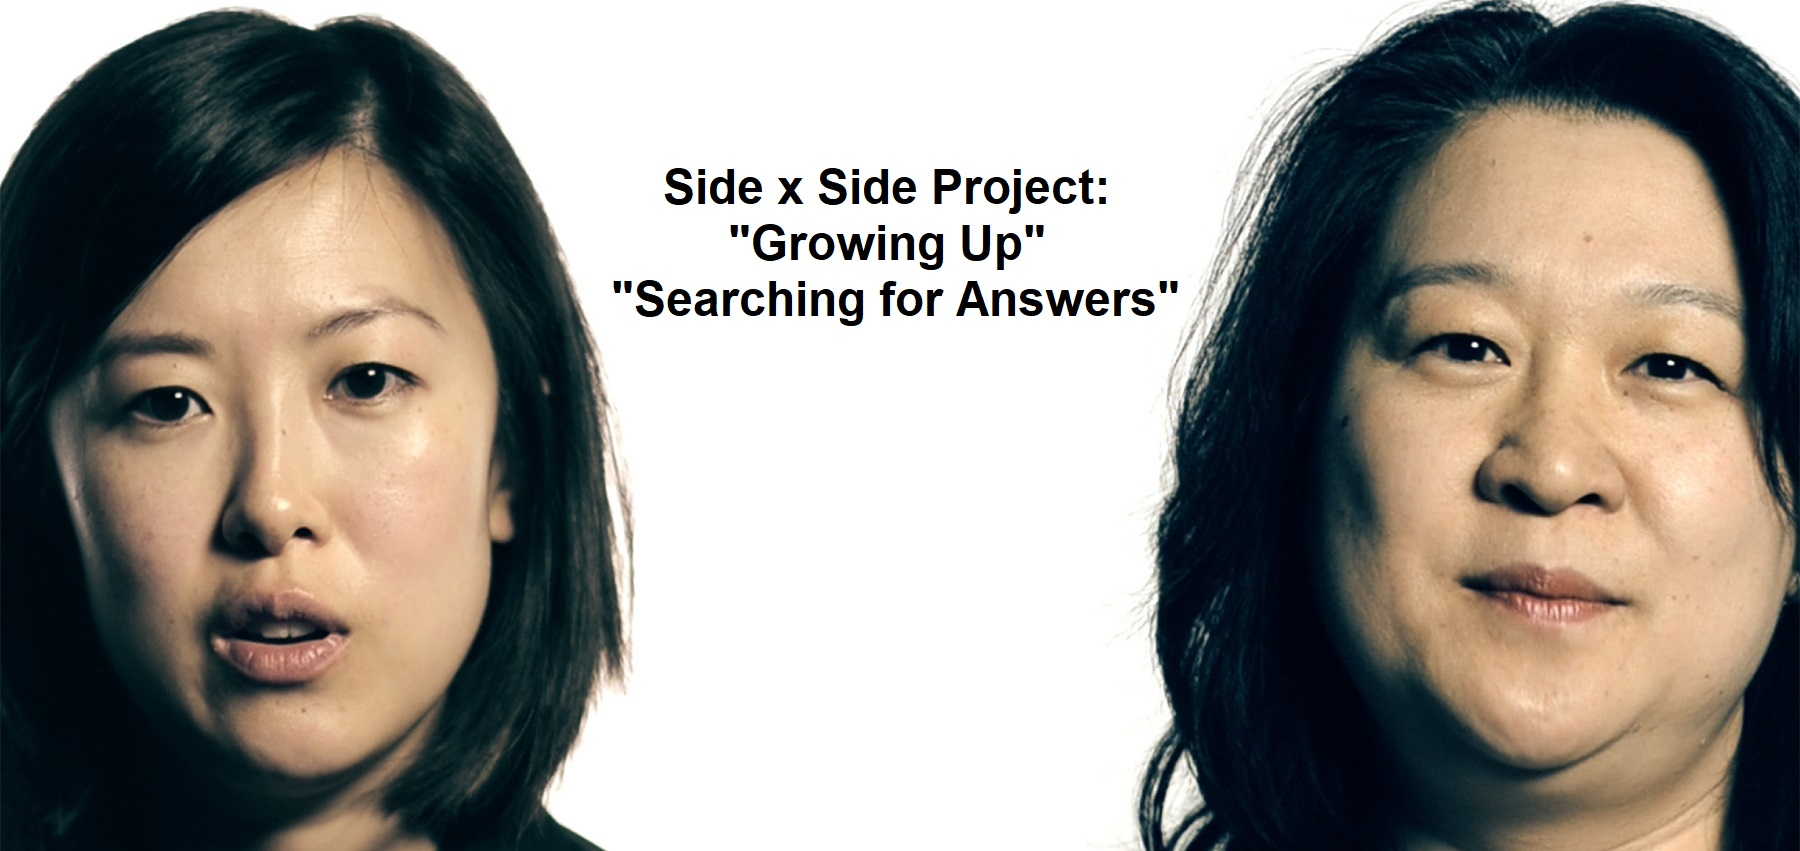 SidebySide-double-joy-1800x851-banner.jpg